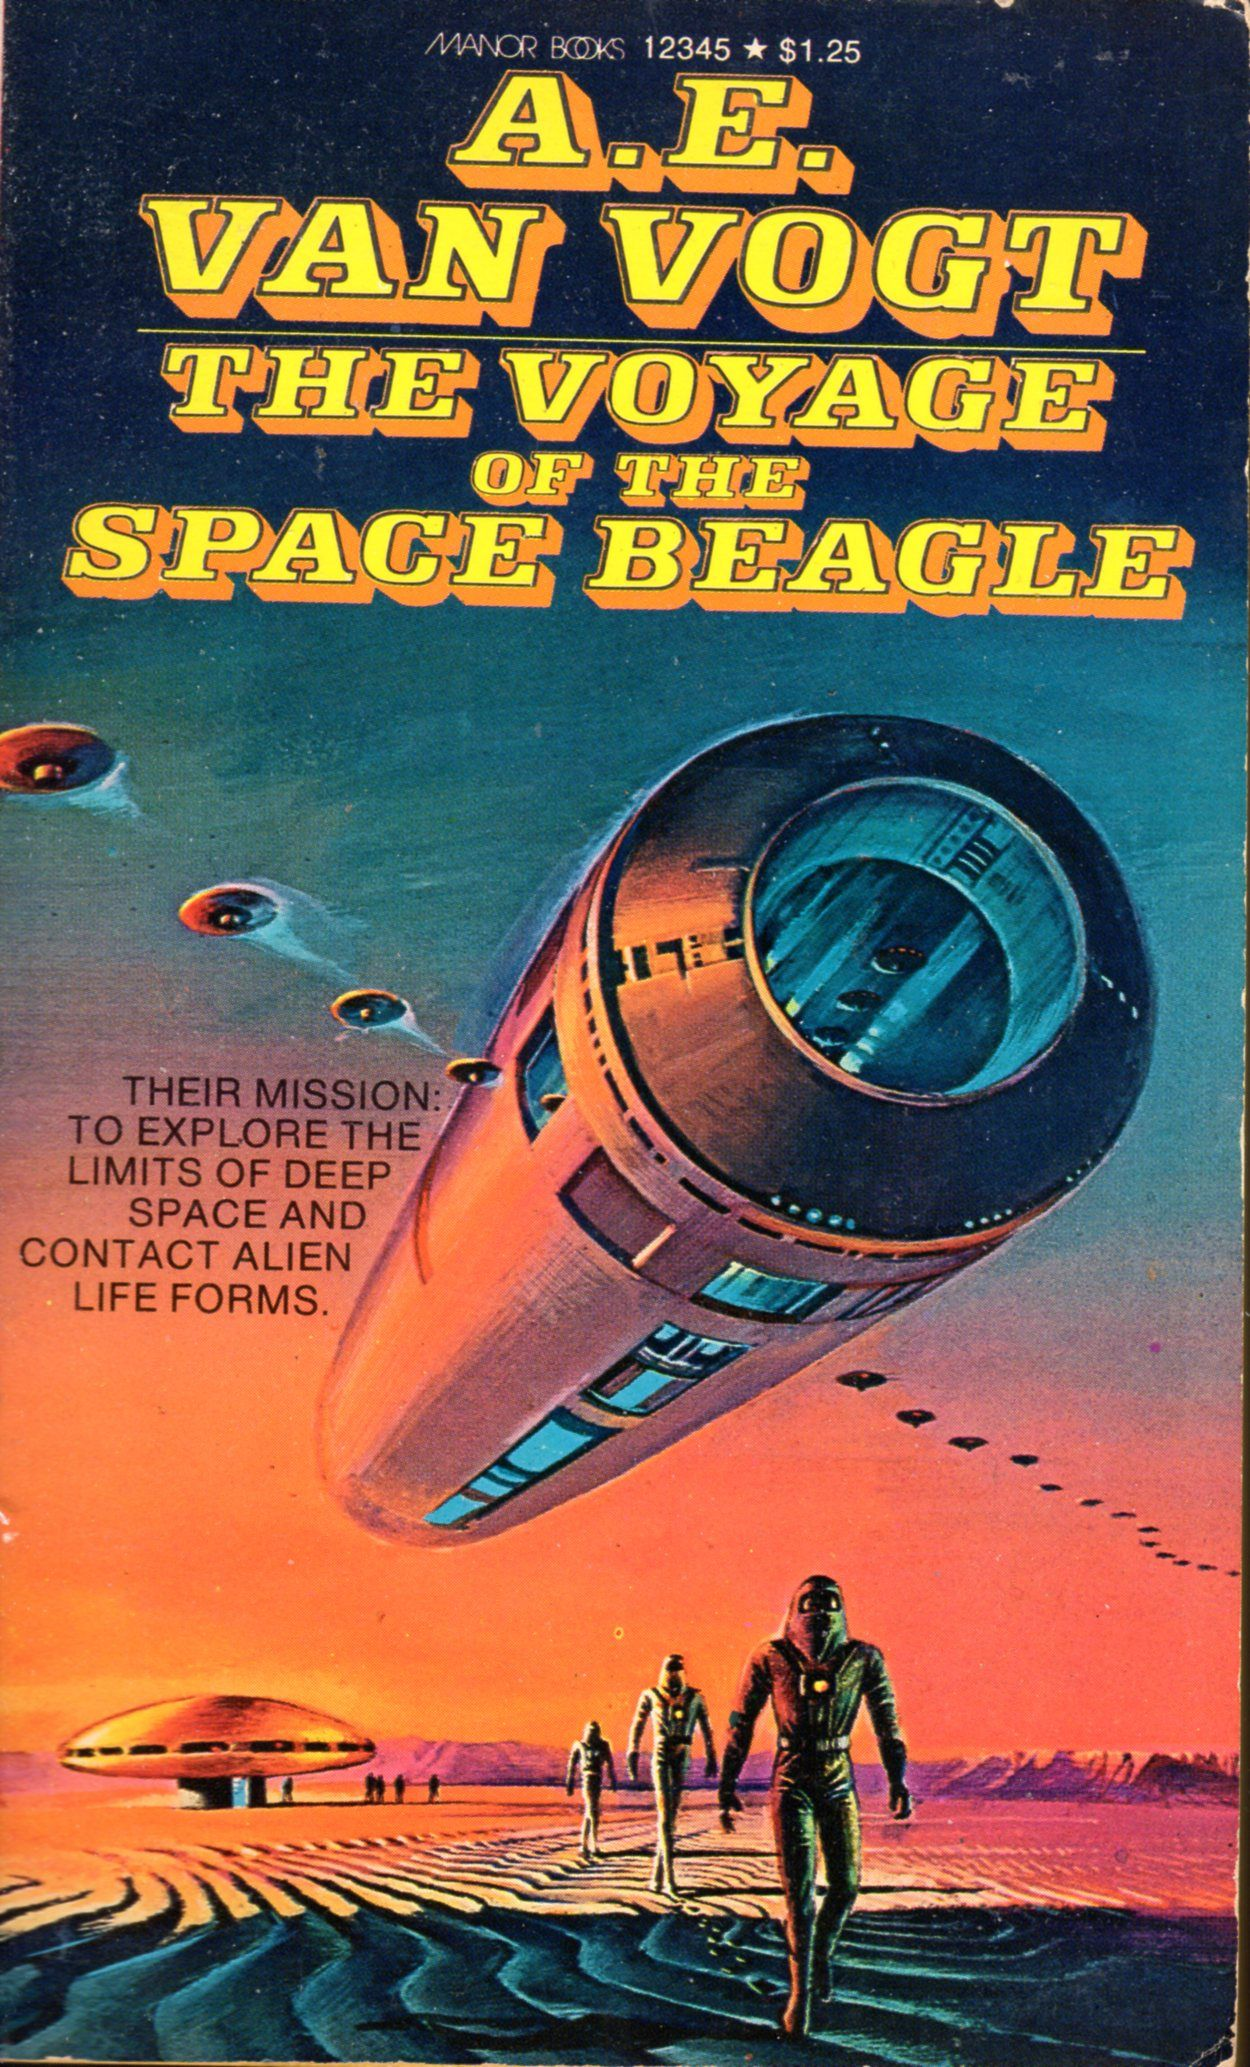 Voyage Of Space Beagle - . Van Vogt Books